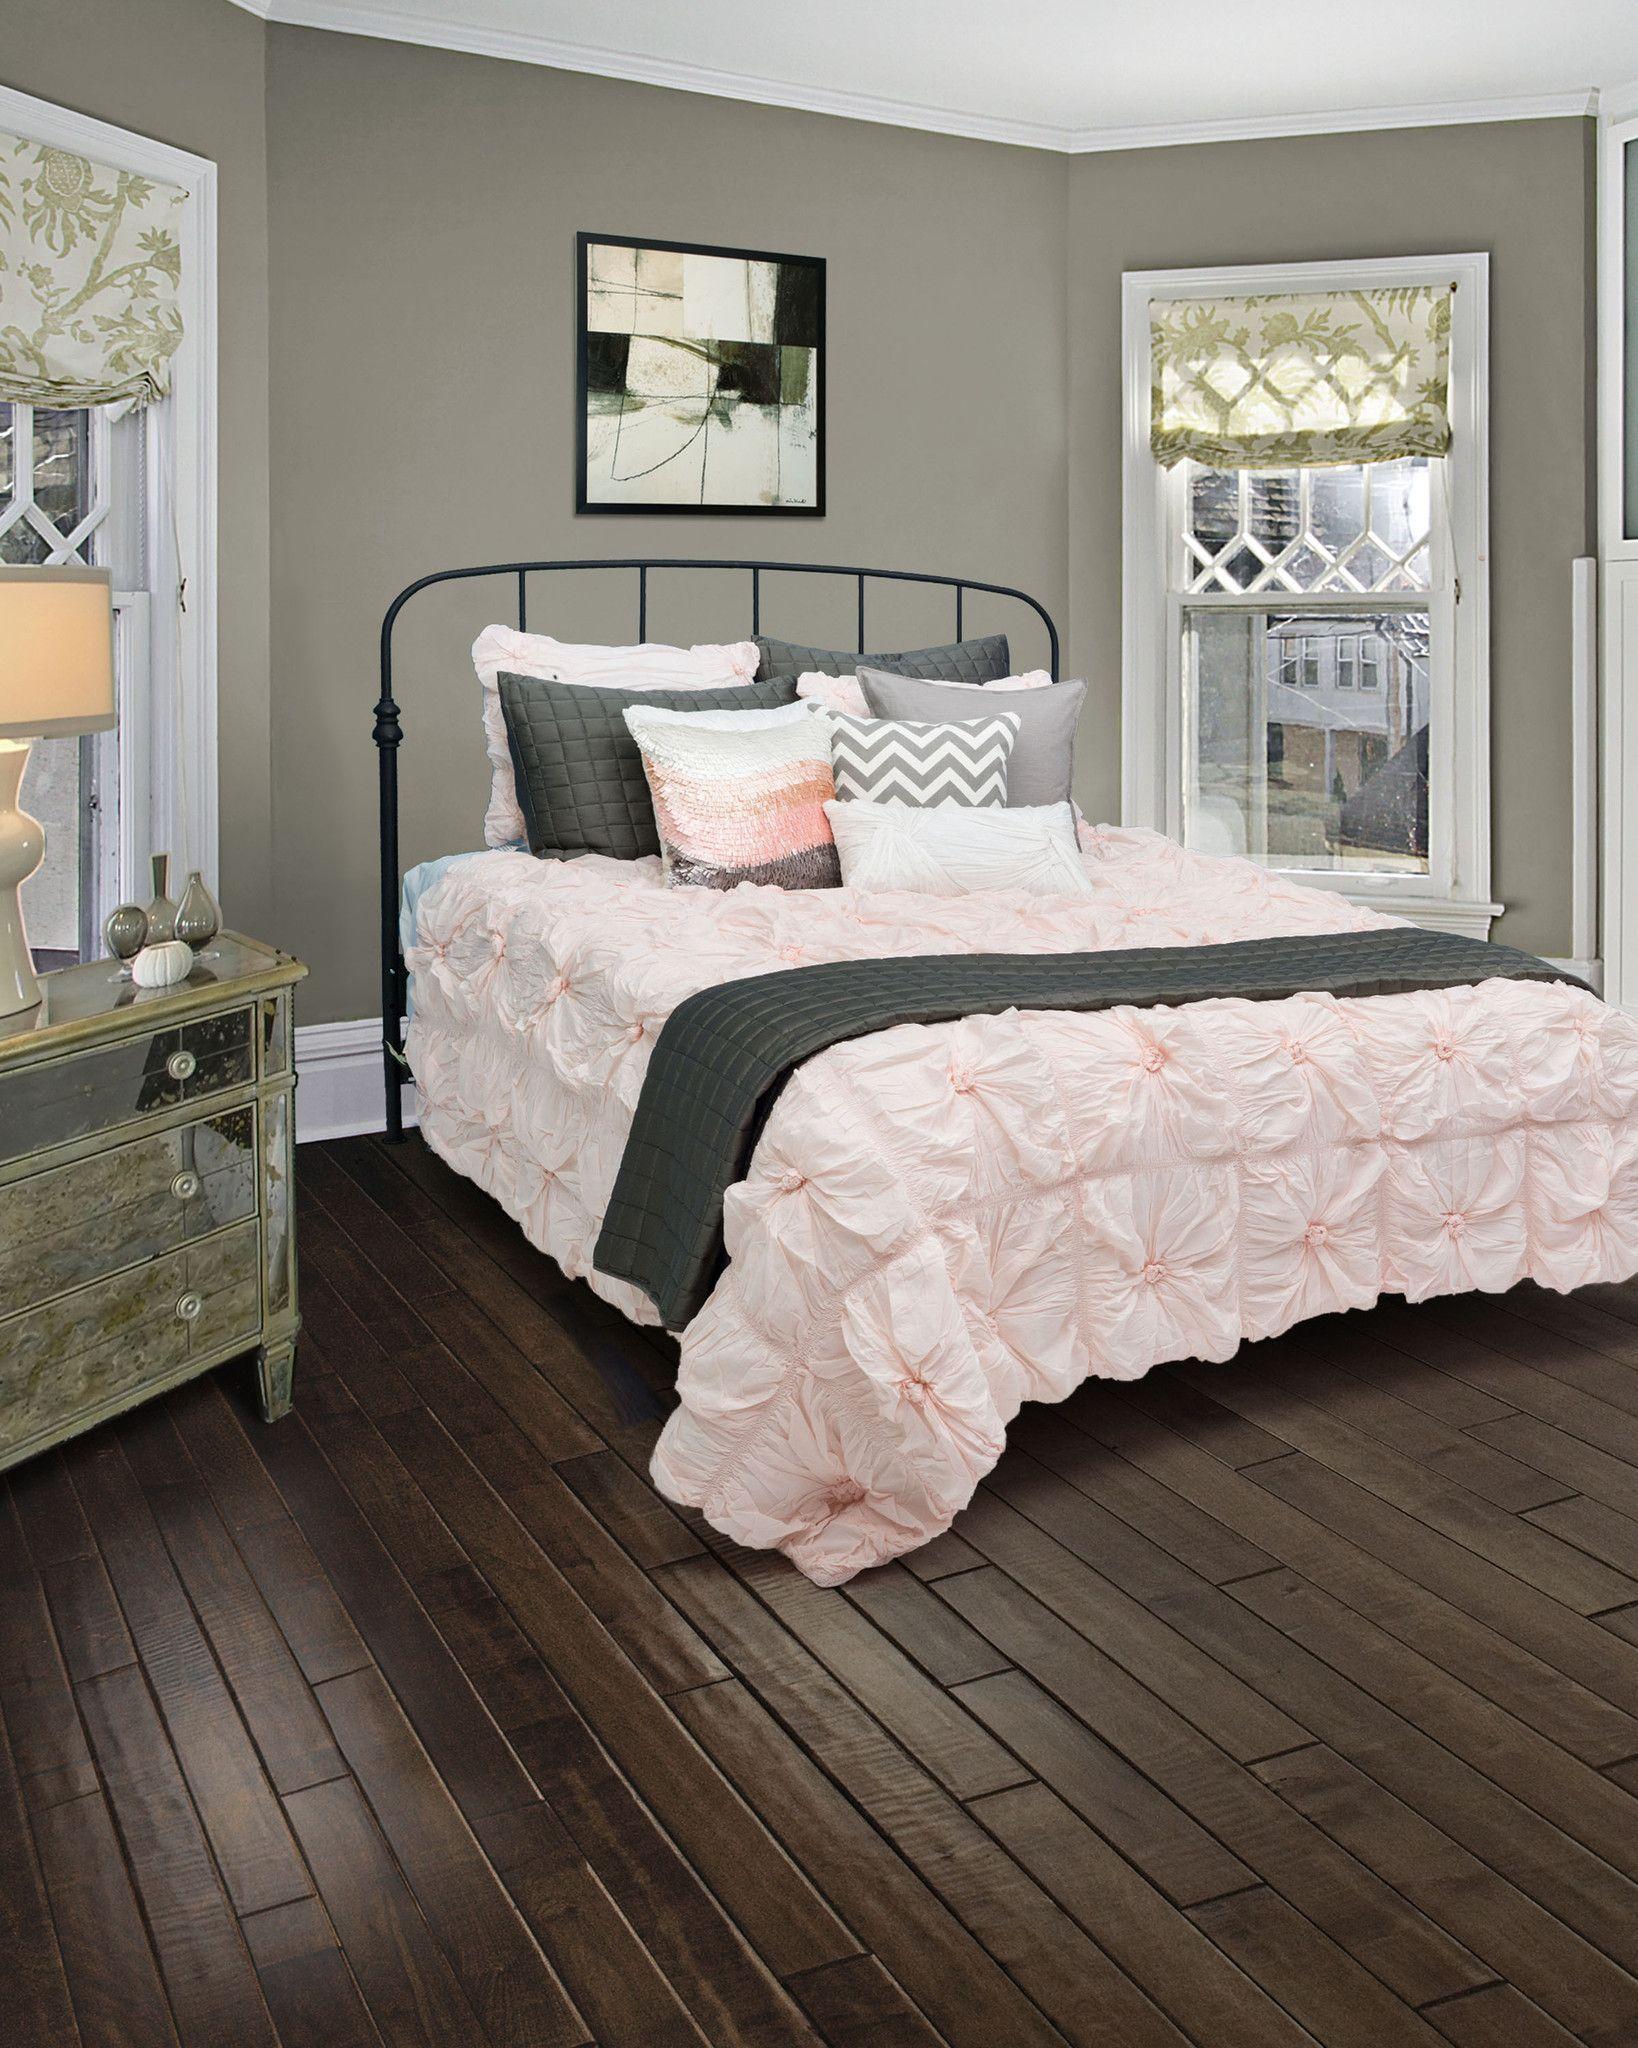 Plush Dreams Lt Pink Full Queen Size Comforter Bed Set